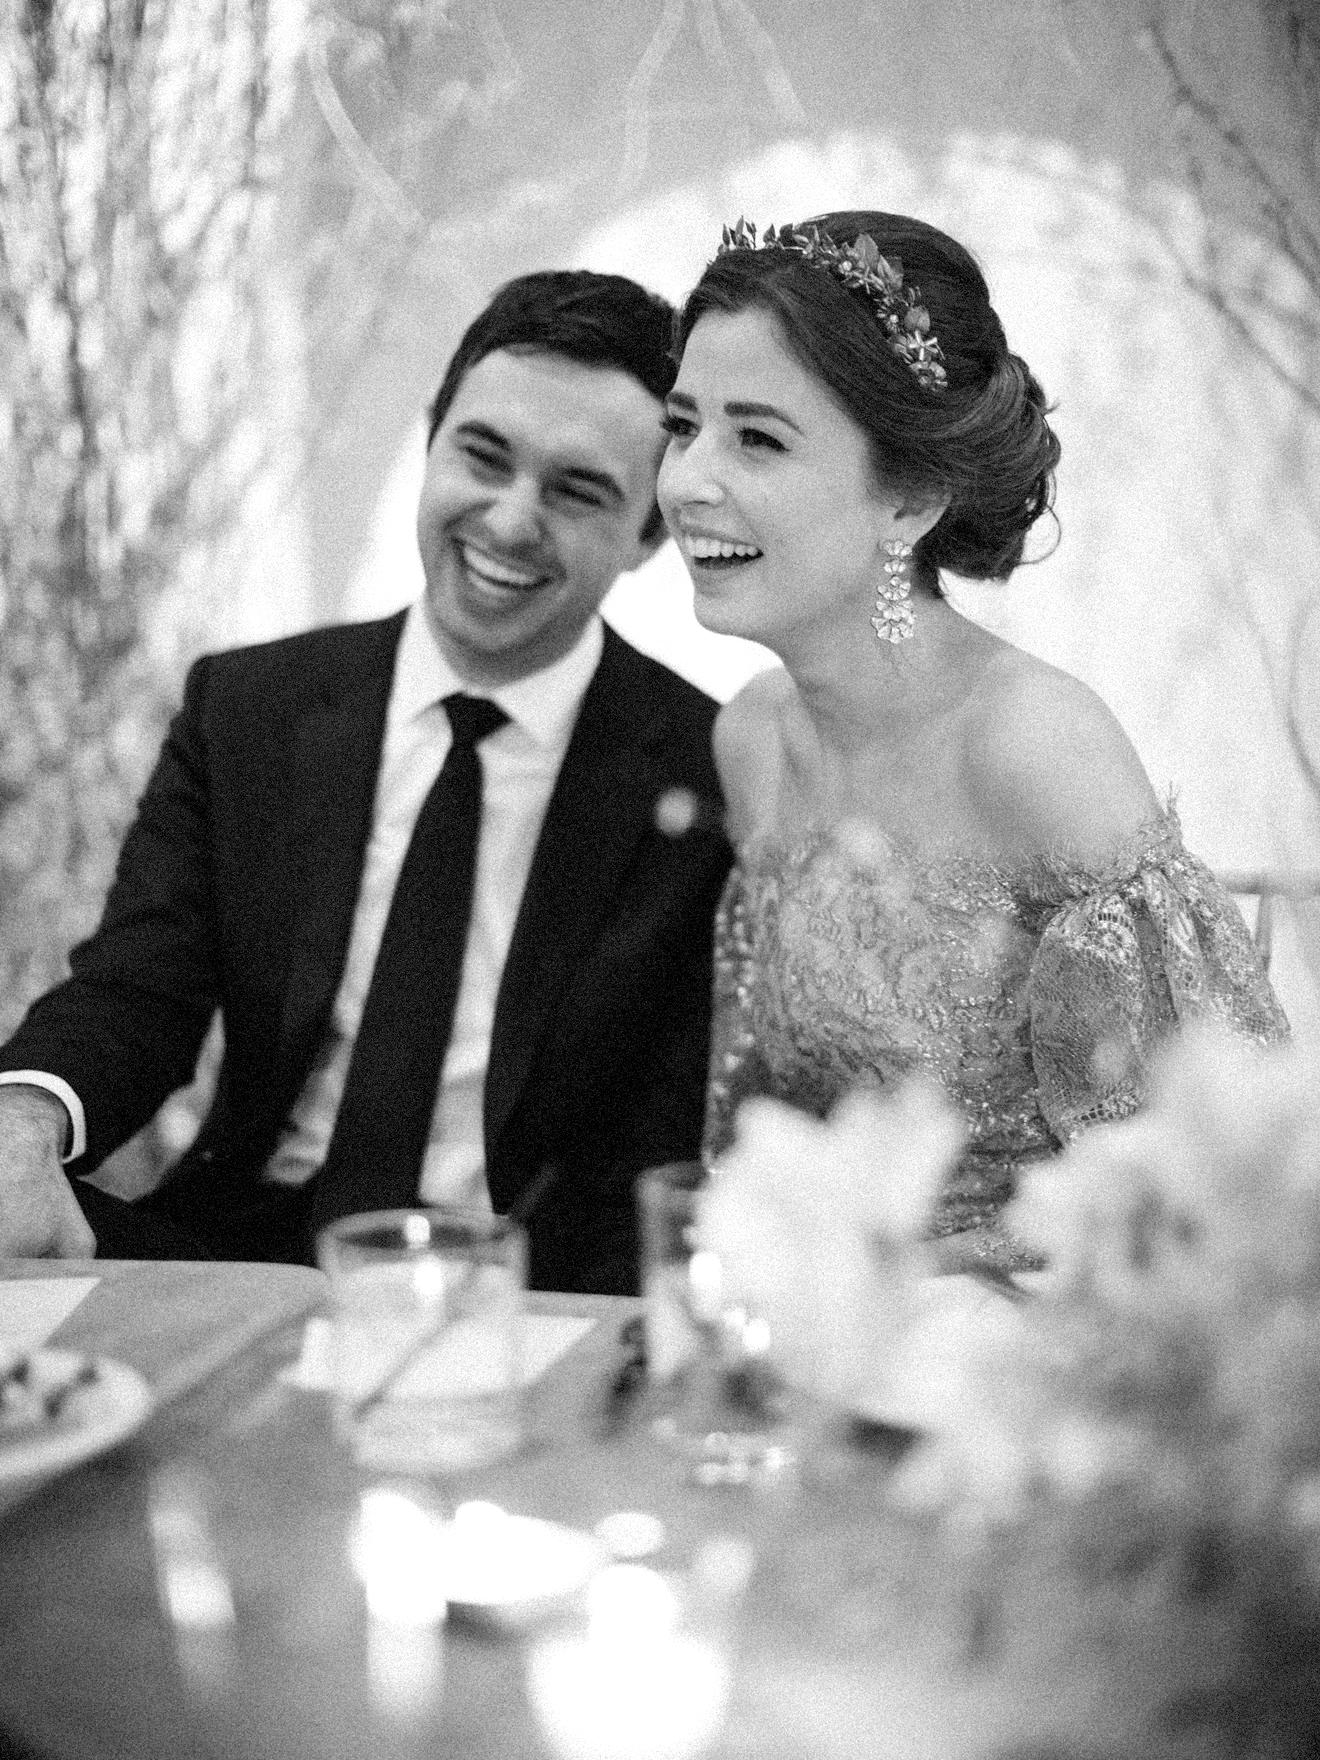 kae danny wedding couple at reception